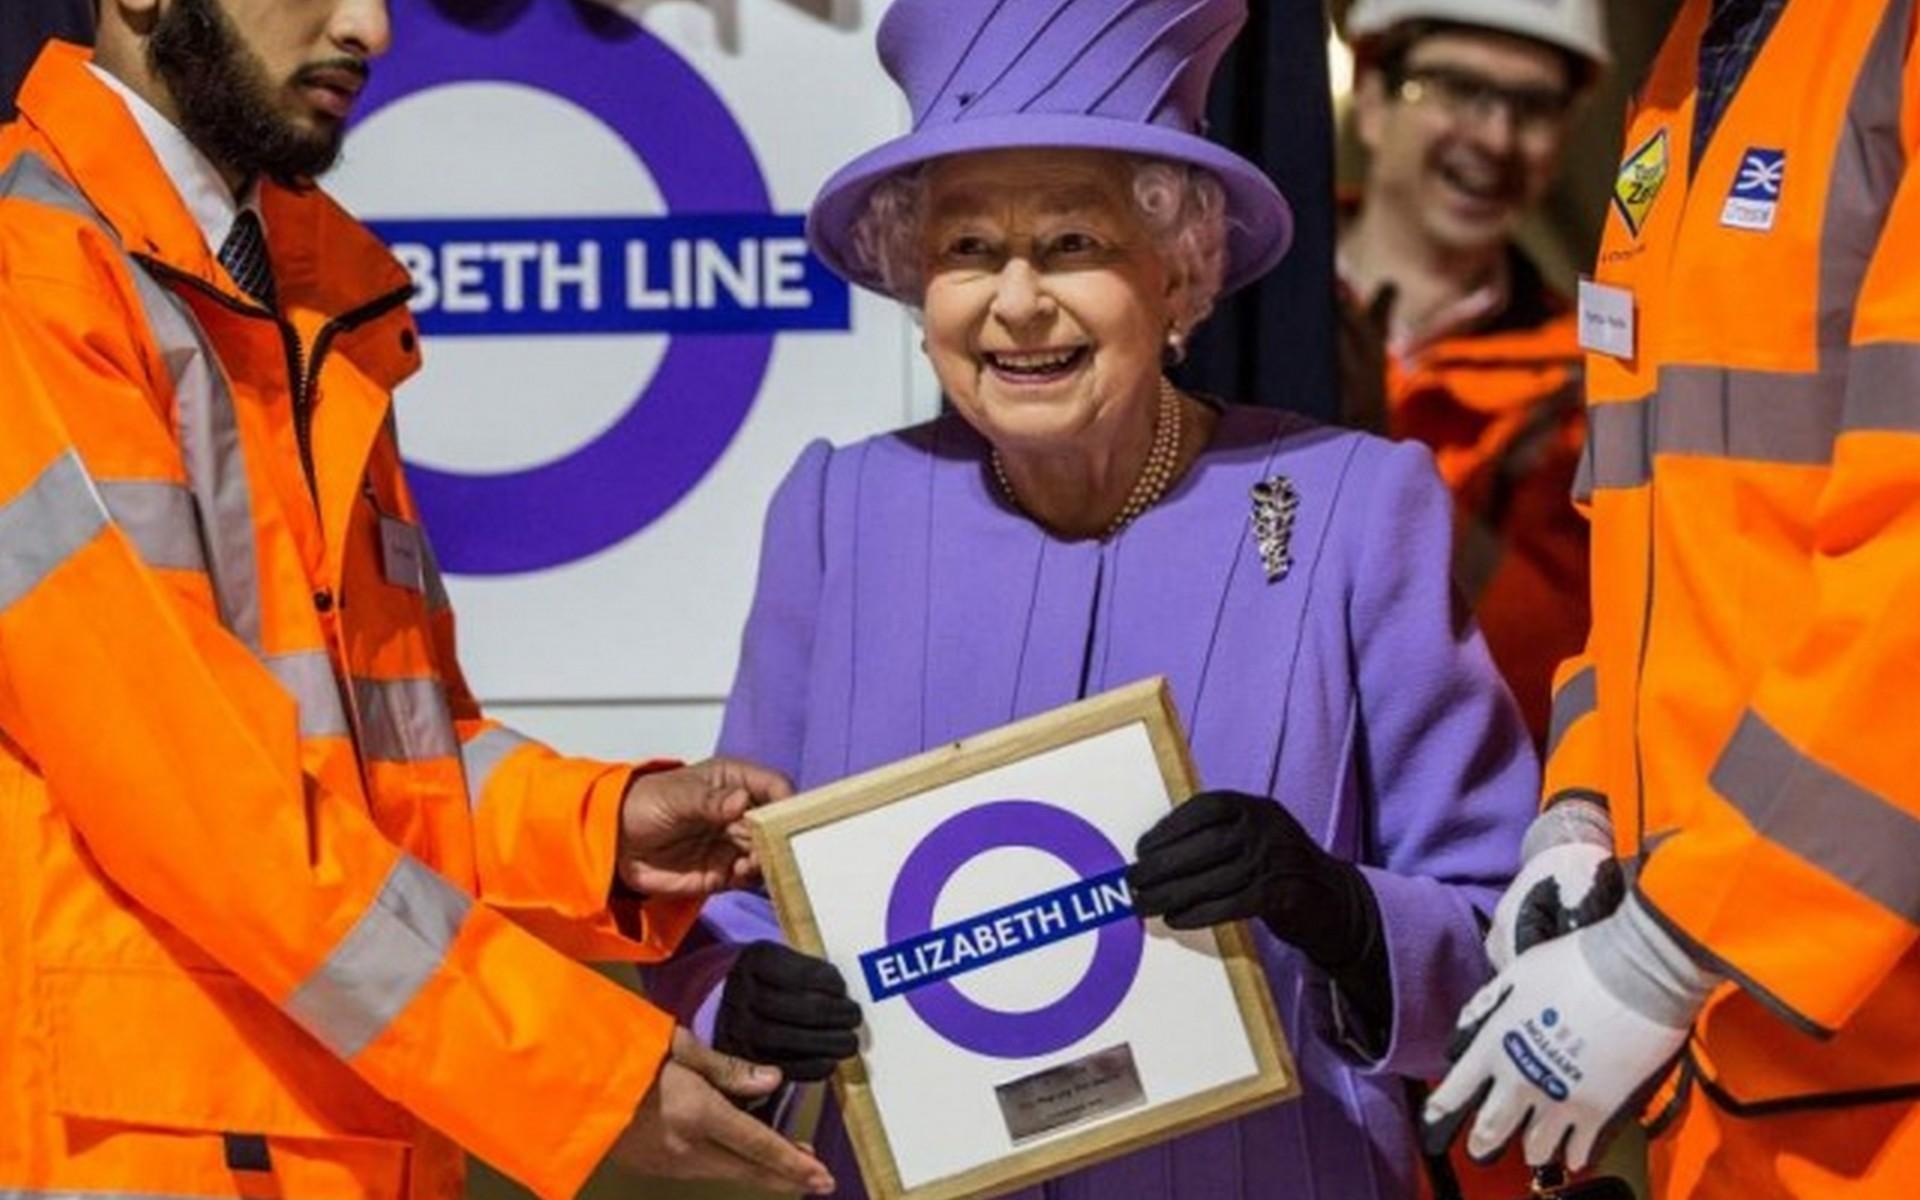 Queen Elizabeth II & Crossrail the Elizabeth Line